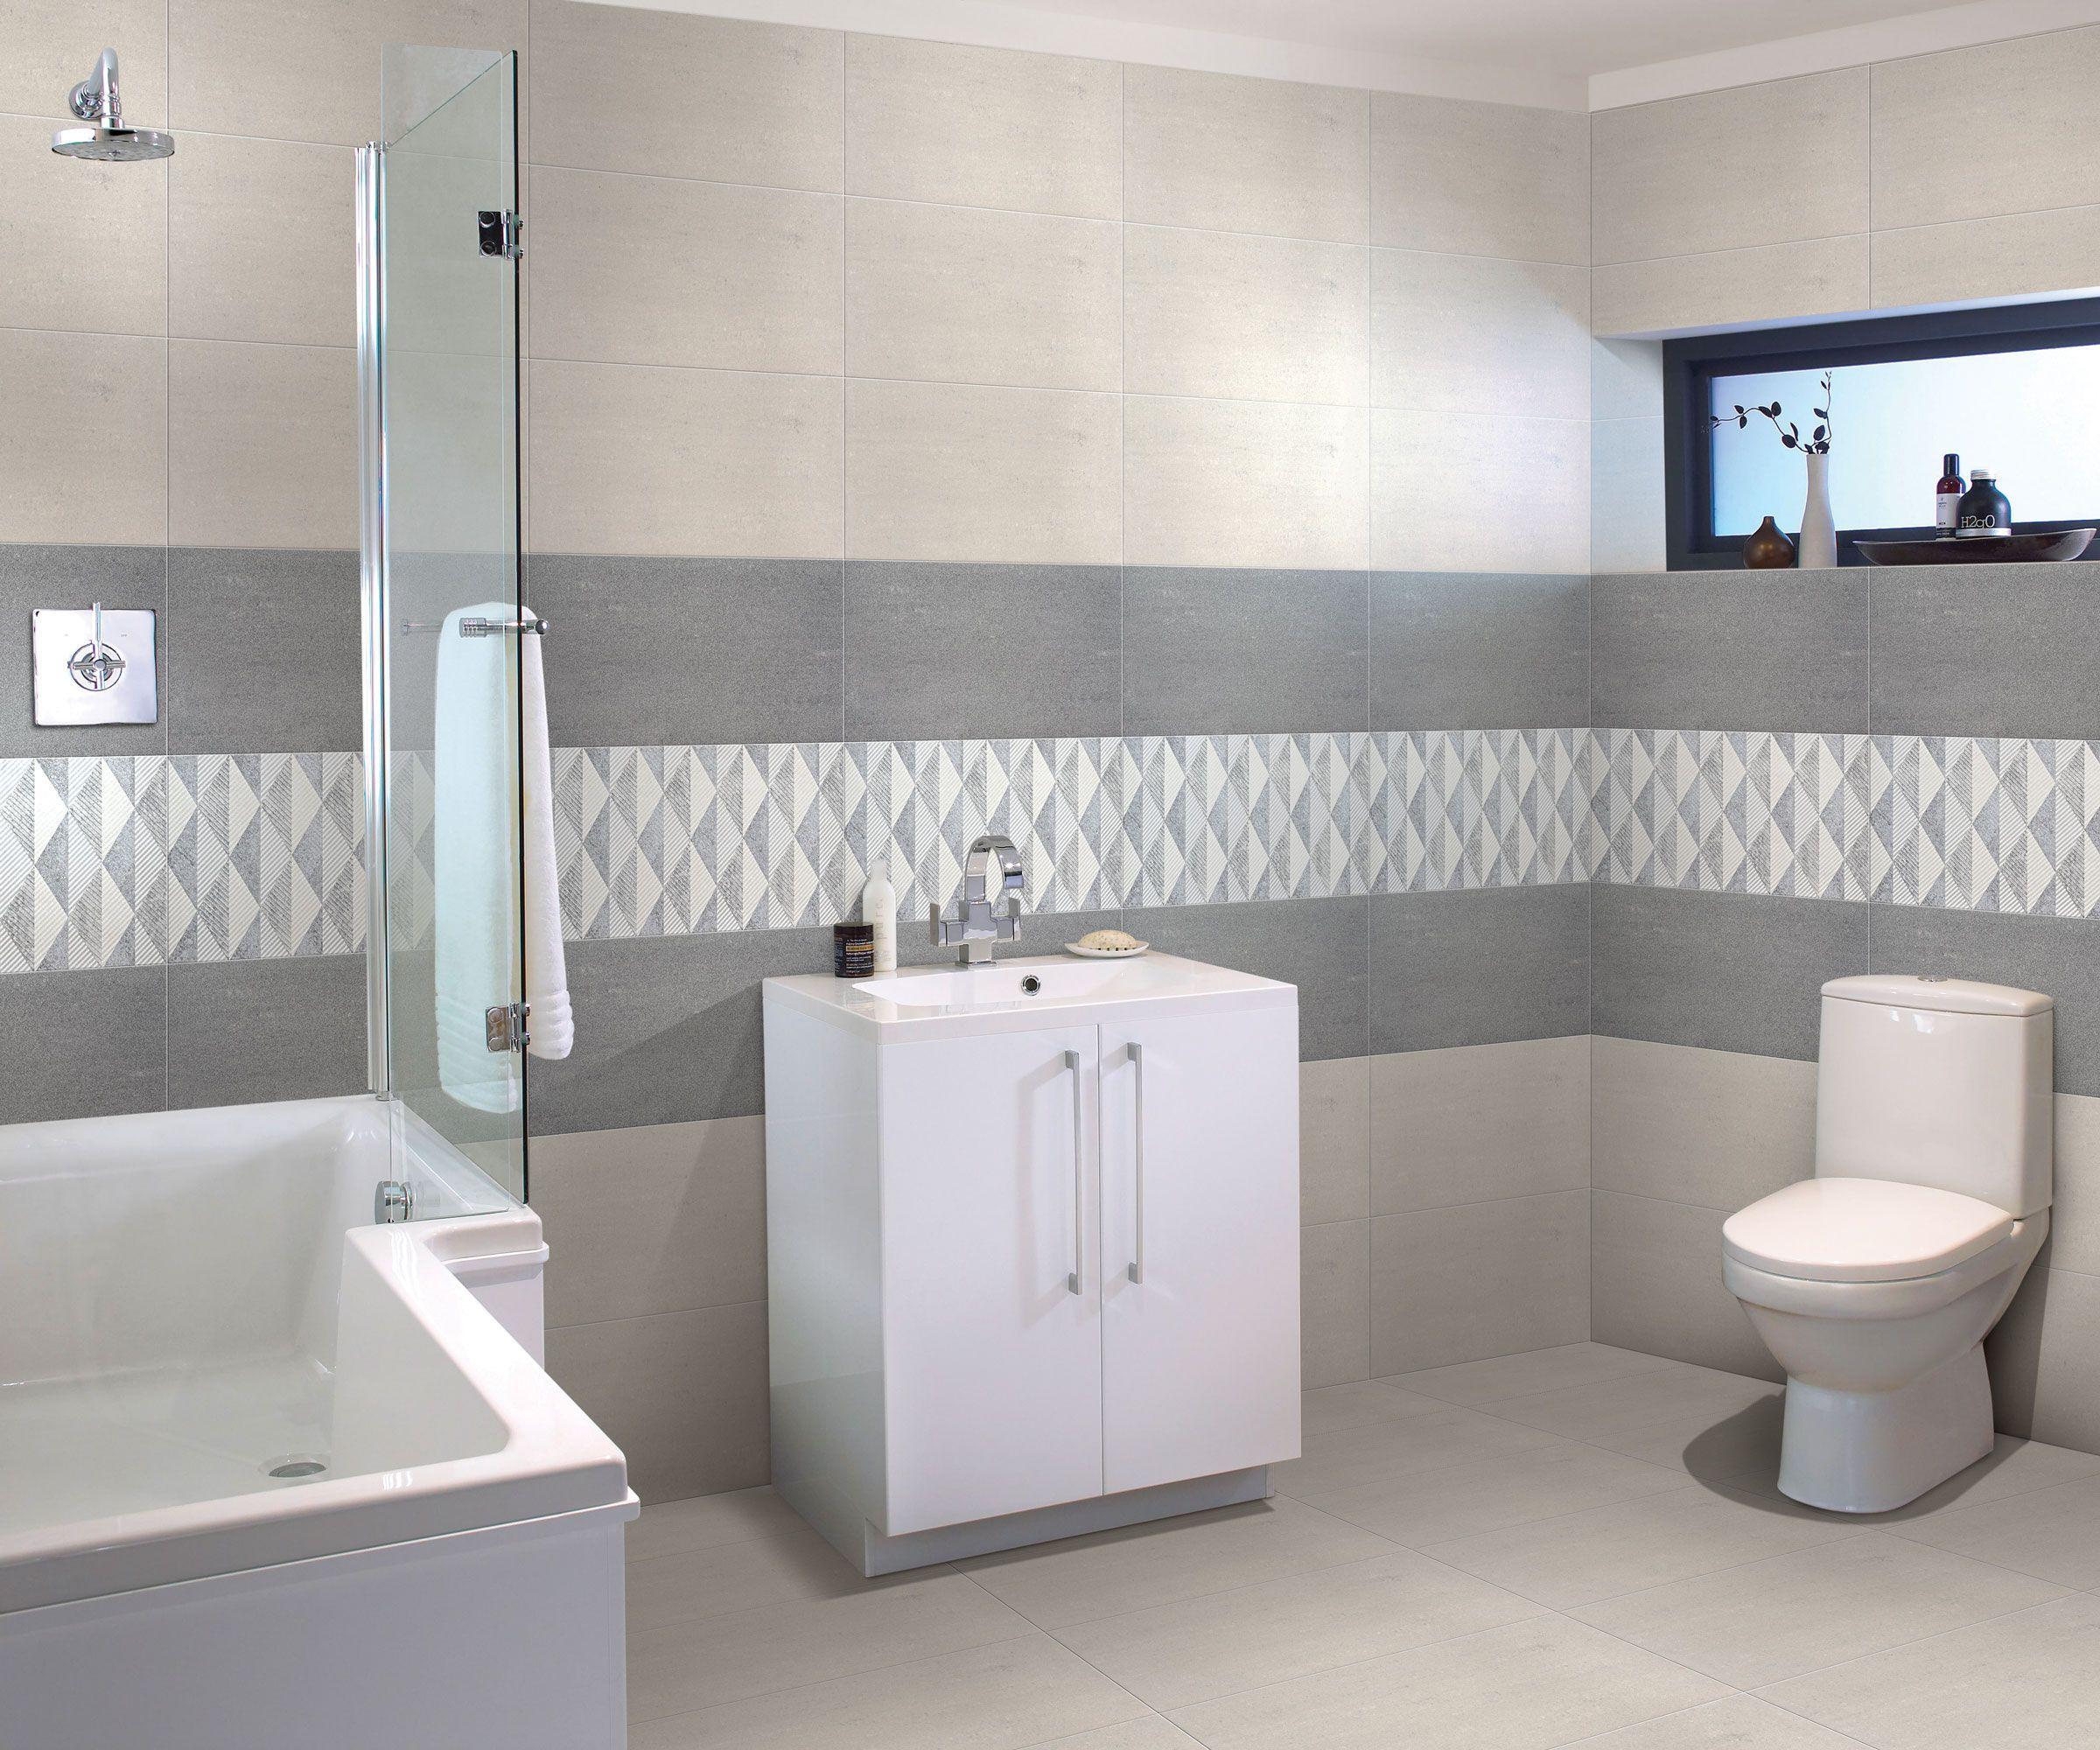 New Post Indian Bathroom Tiles Design Visit Bobayule Trending Decors Bathroom Wall Tile Design Bathroom Wall Tile Bathroom Tile Designs